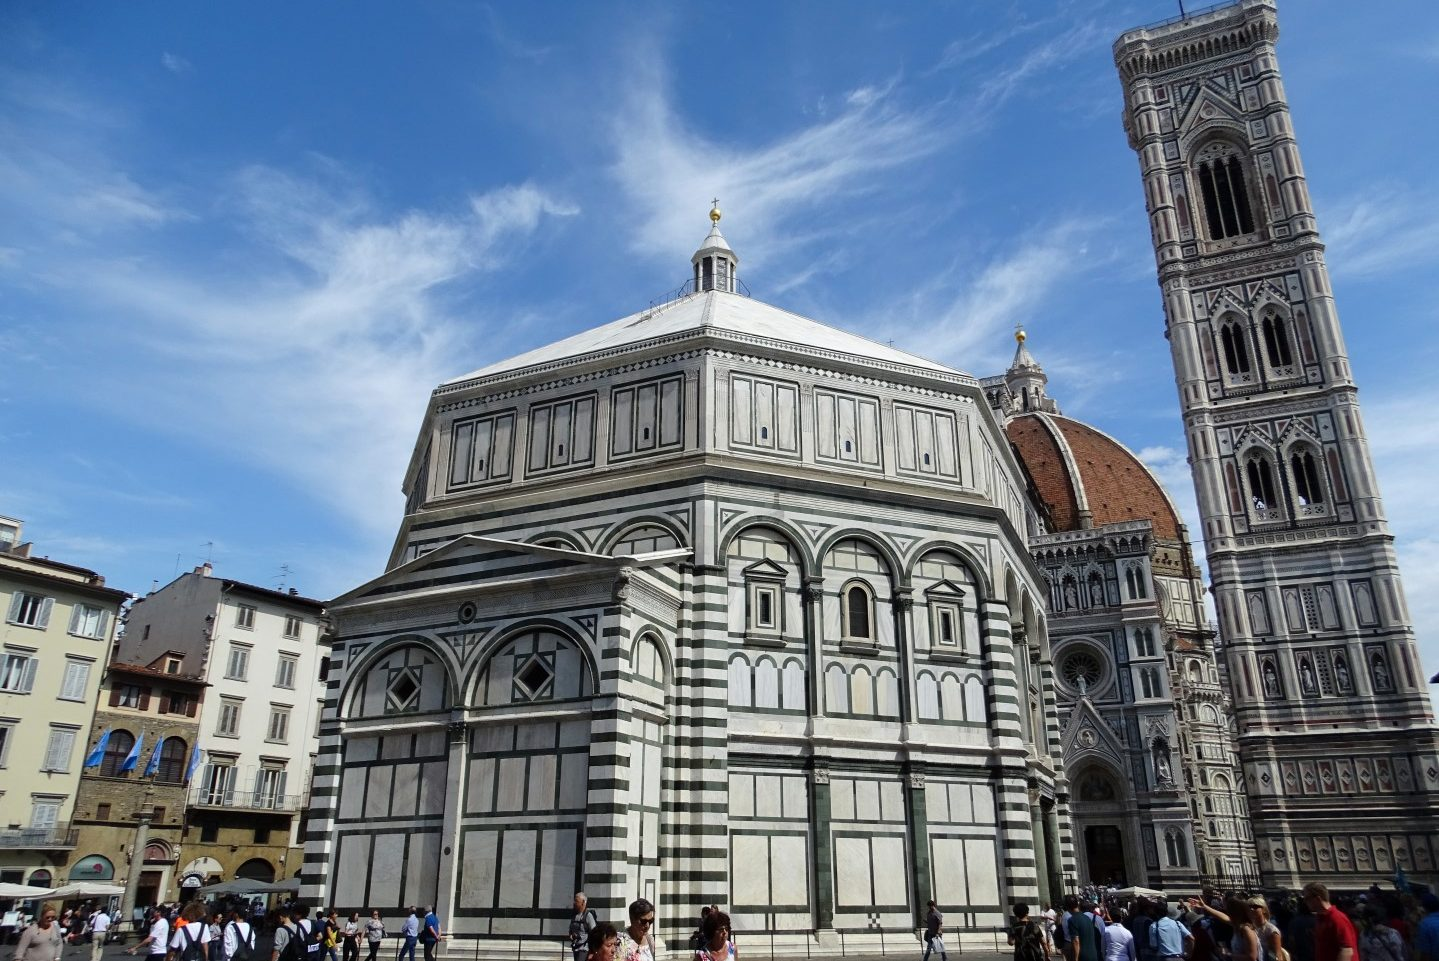 Doumo Firenze